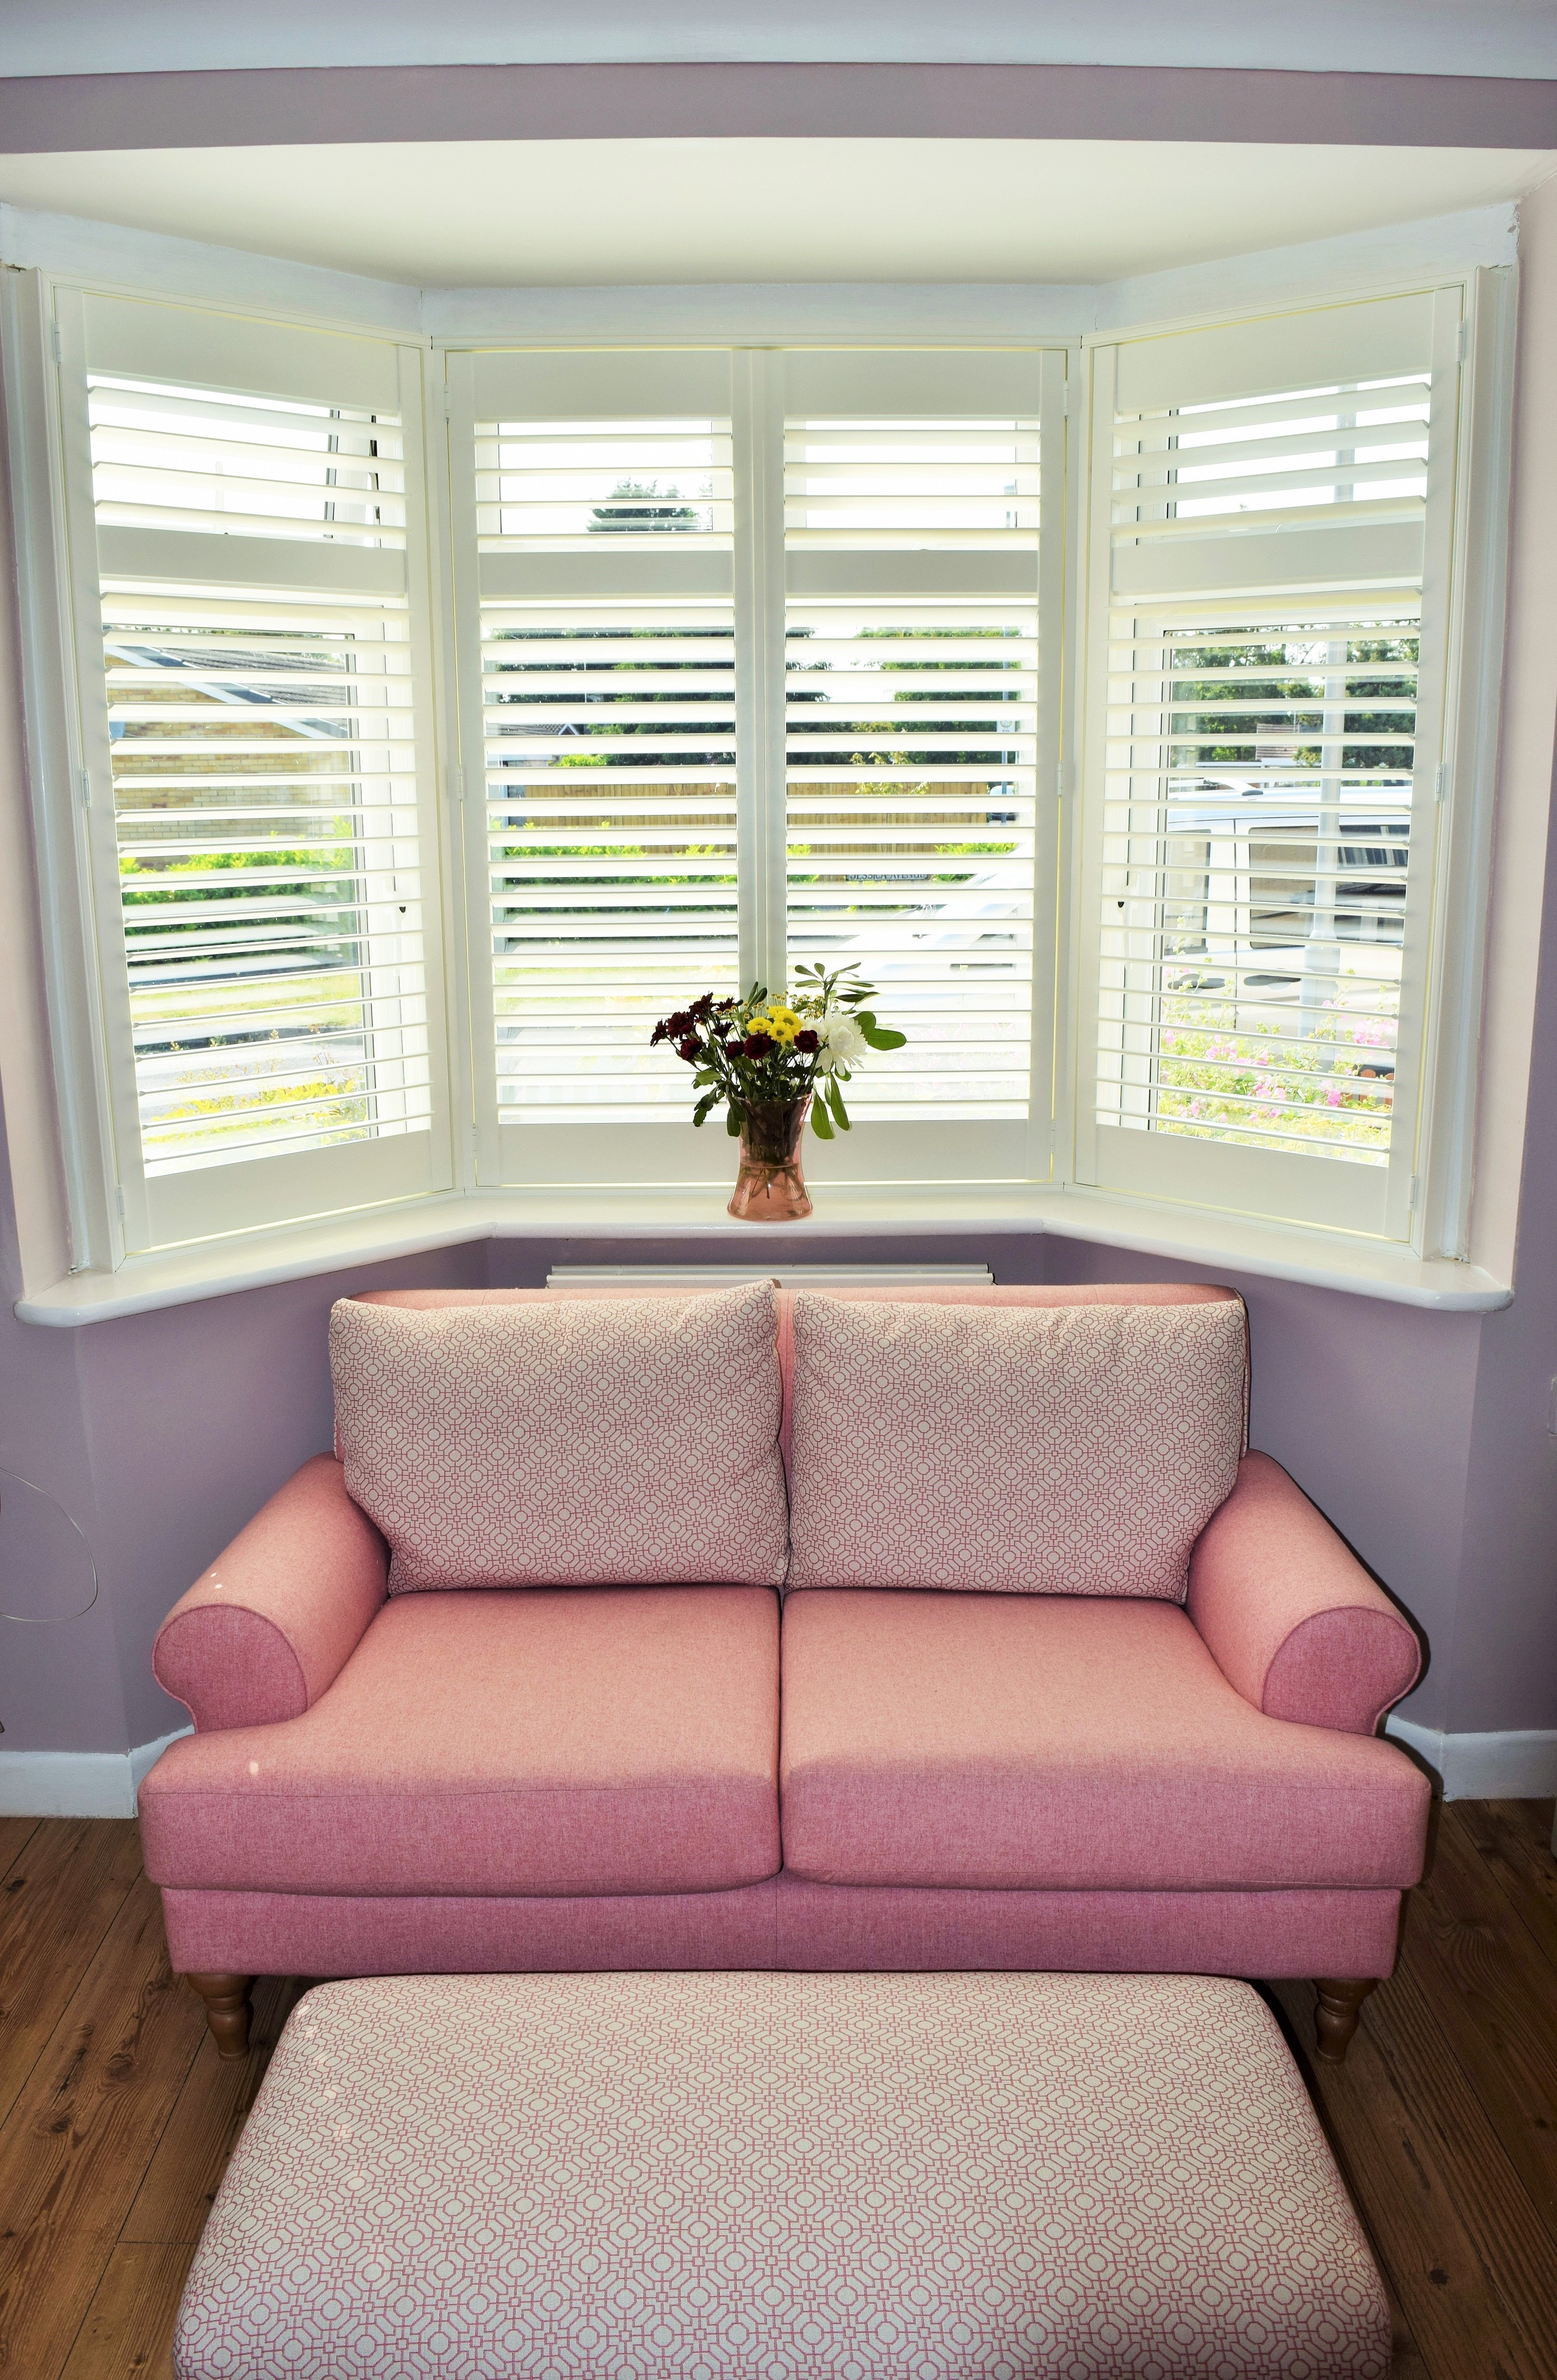 Bay window shutters Verwood Ringwood Dorset.JPG